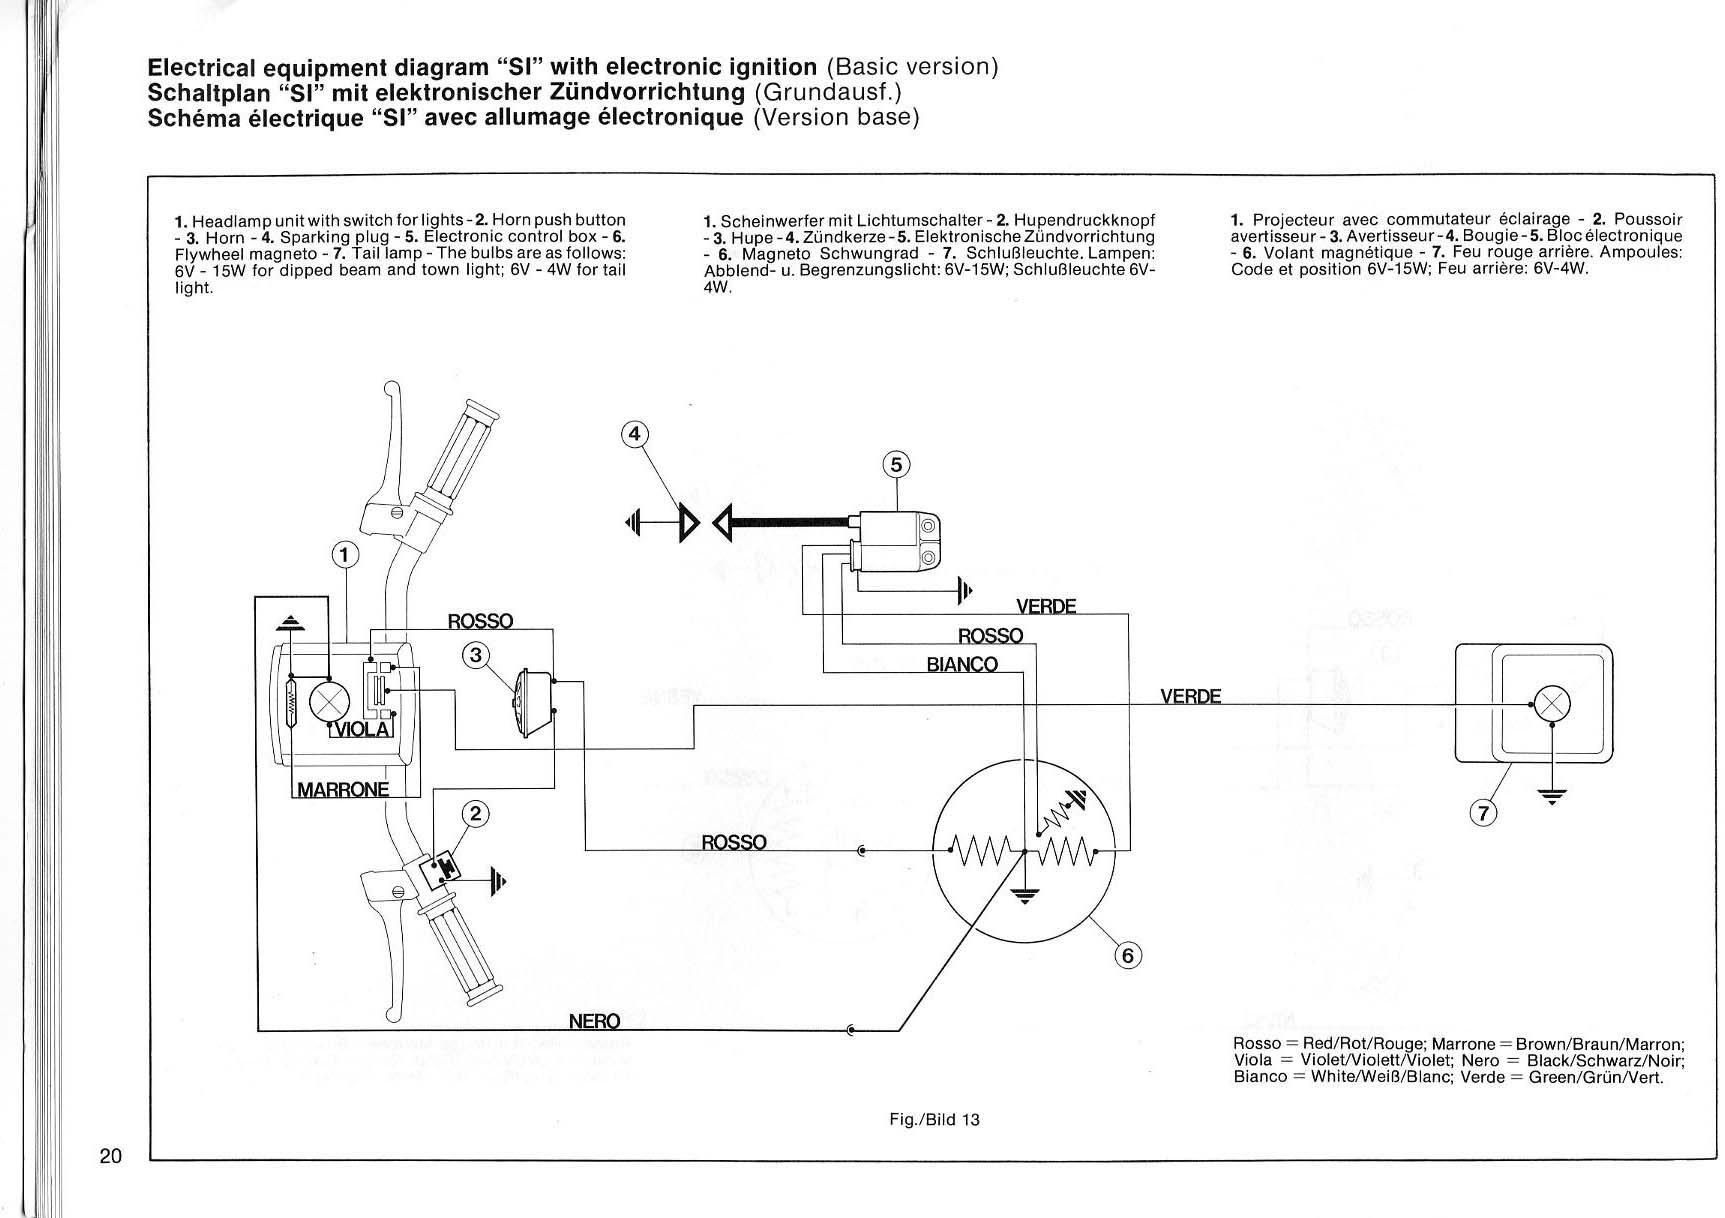 Schema Elettrico Trattore : Pin schema elettrico trattore texte on pinterest